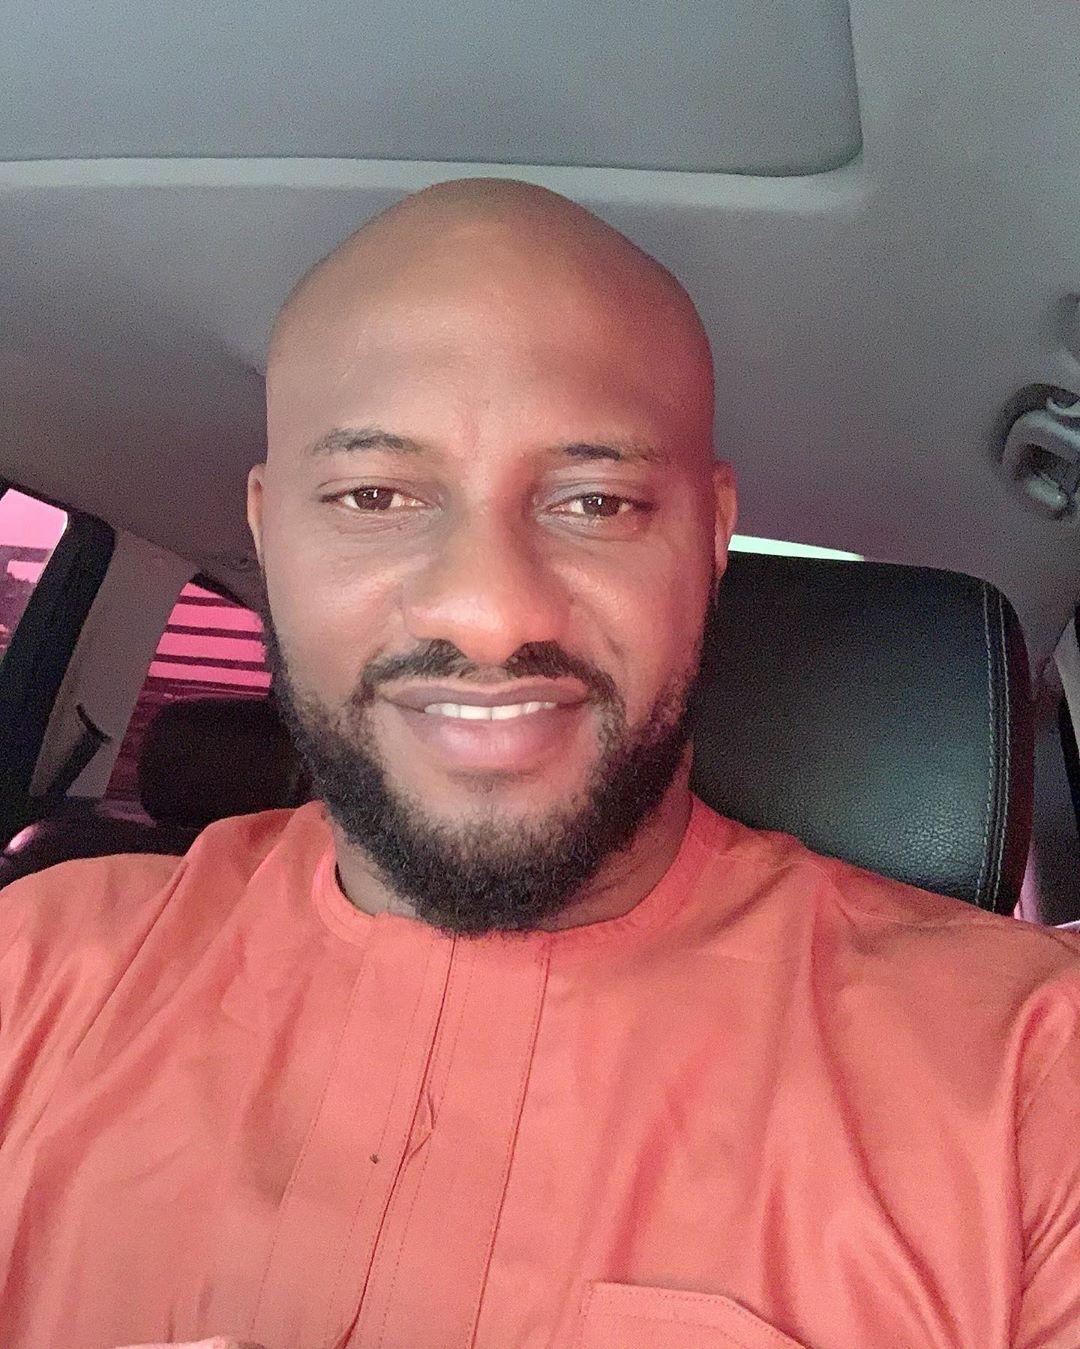 'Whether Angela Okorie's story is true or not, She's hurt & needs well-wishing' – Yul Edochie tells Nigerians